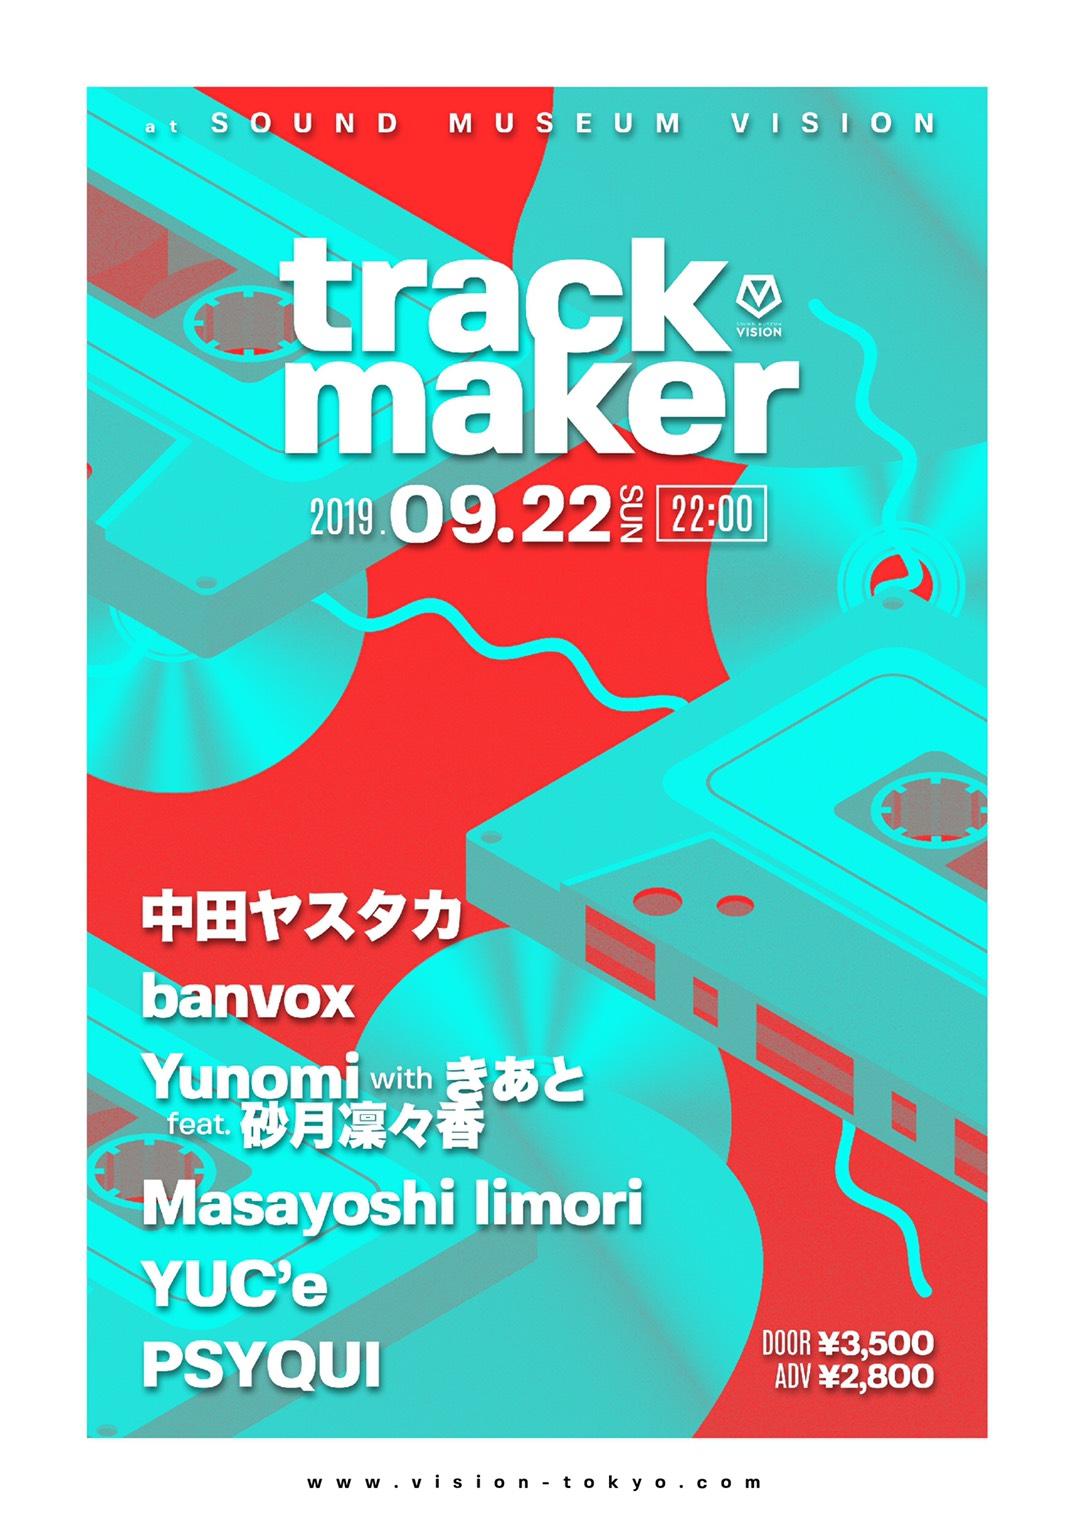 trackmaker【中田ヤスタカ/banvox/Yunomi/砂月凜々香】